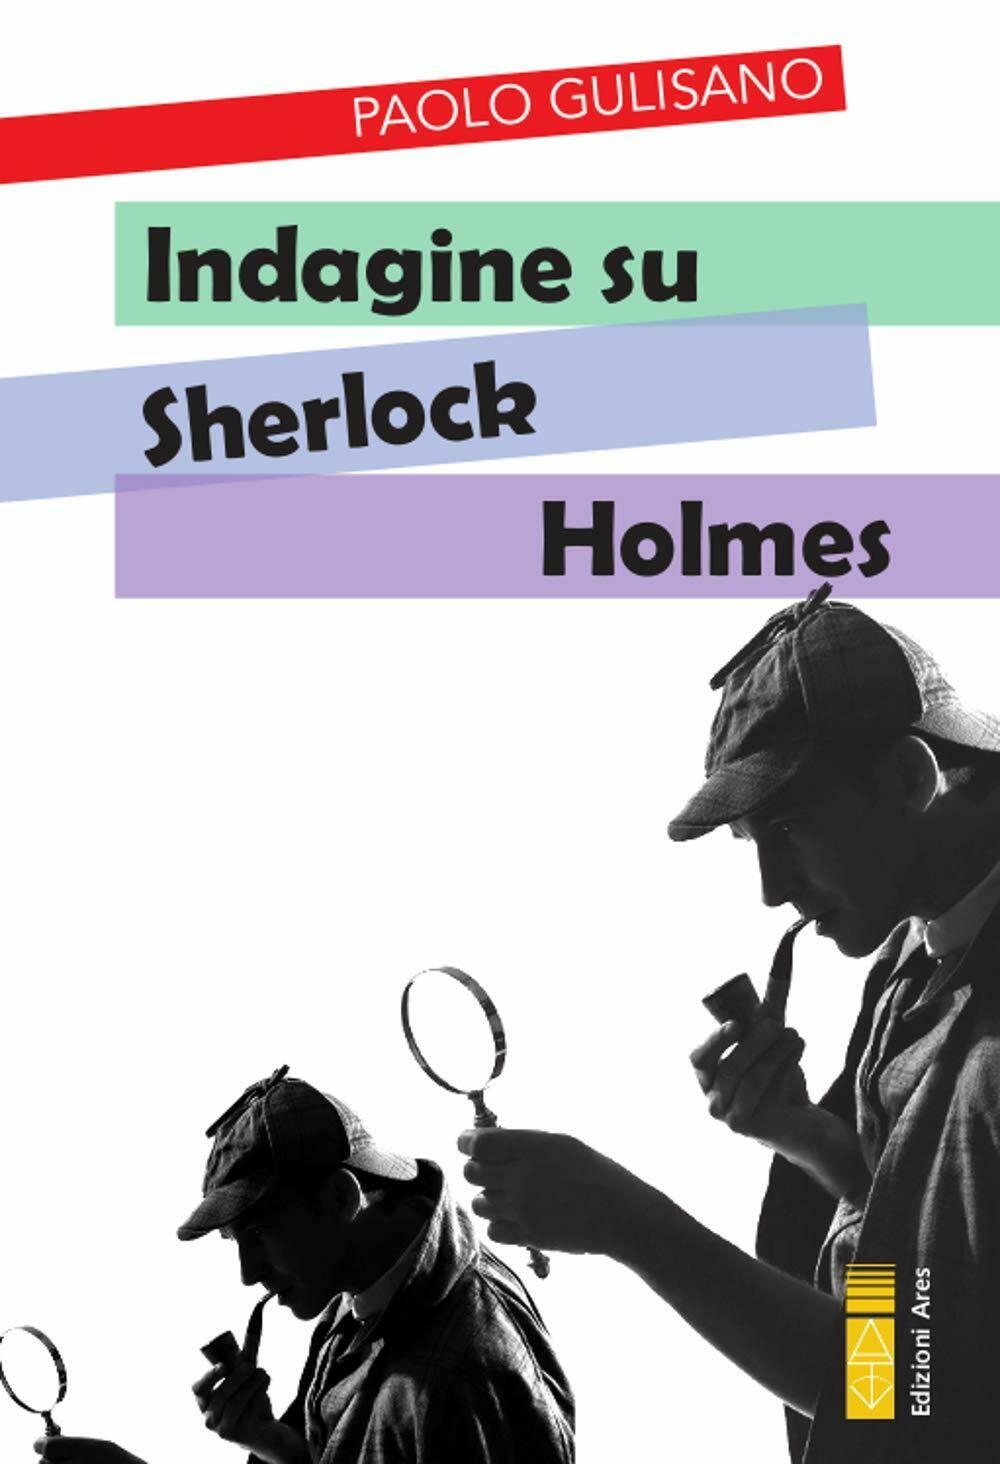 Indagine su Sherlock Holmes